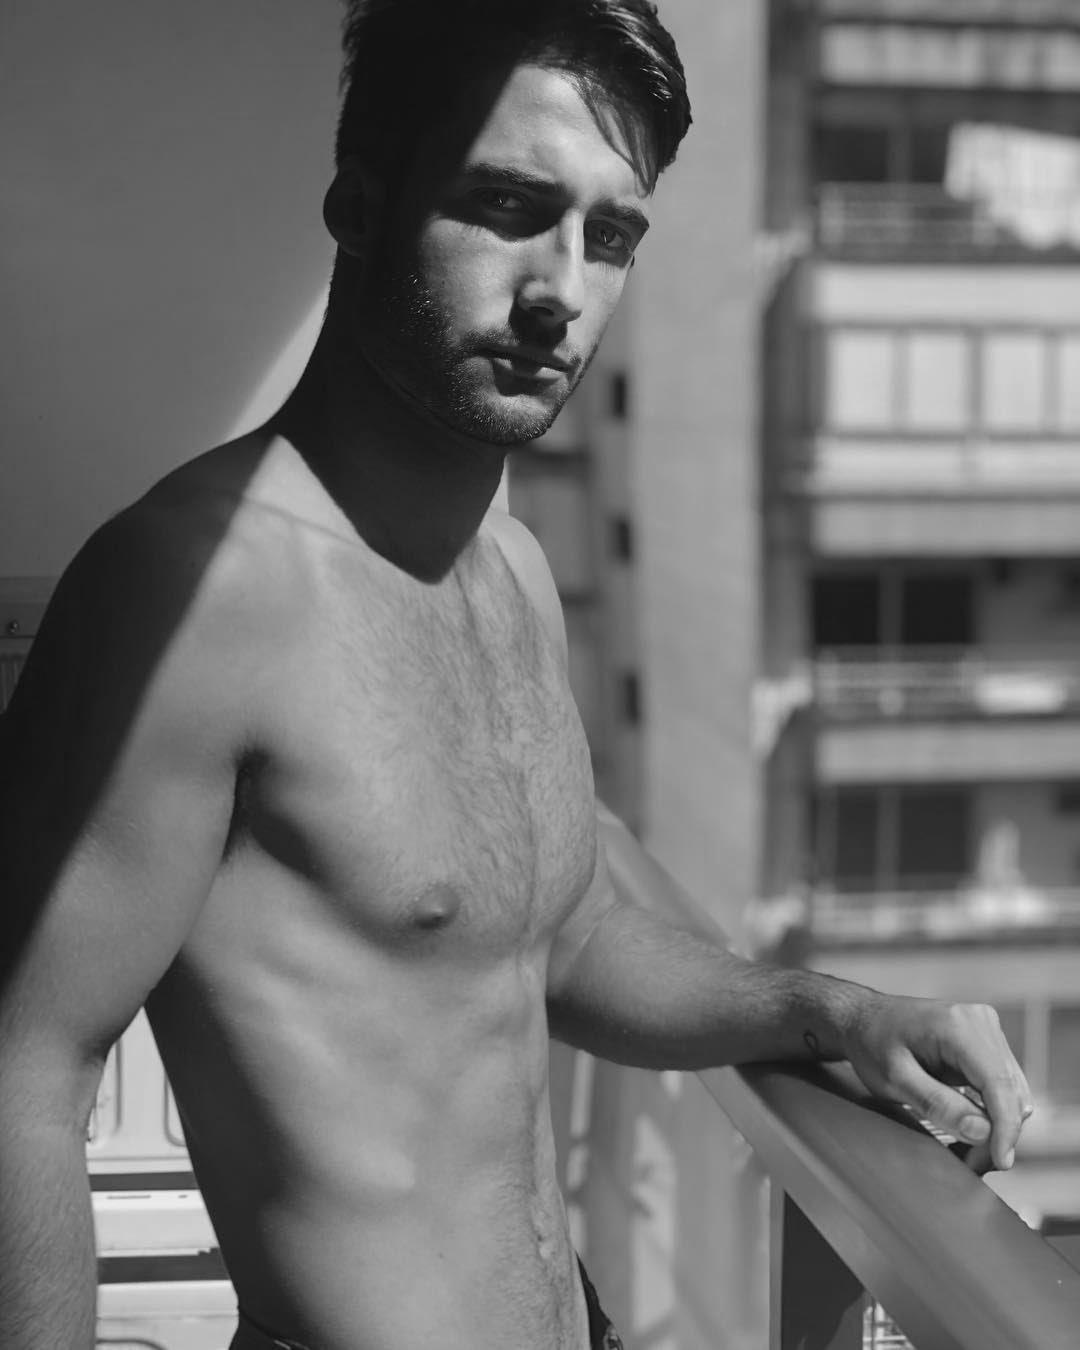 ShadowS, by Valentino Ayello